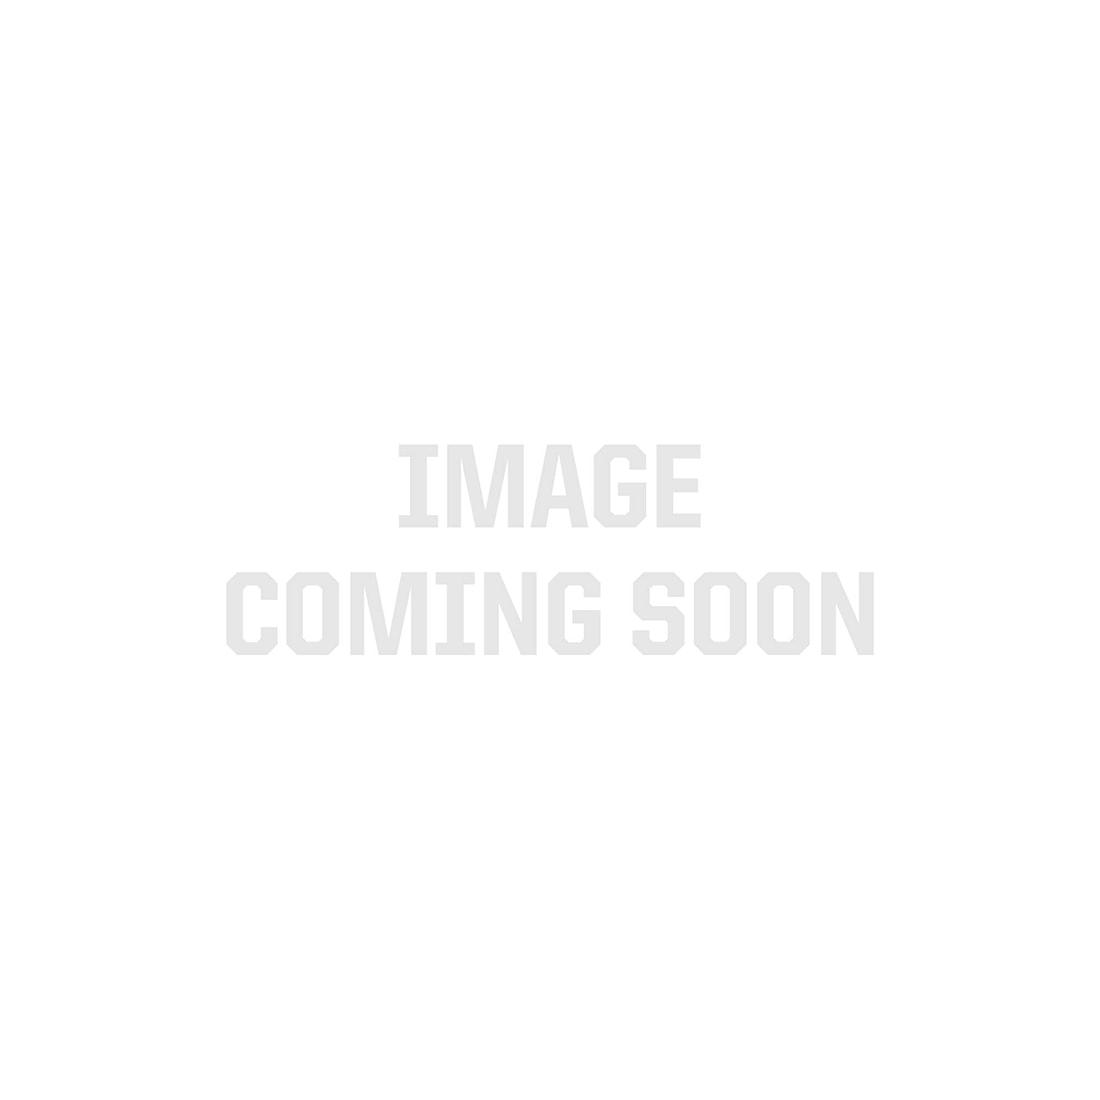 HyperFlex 5050 LED Strip Light - RGB - 60/m - CurrentControl - Sample Kit